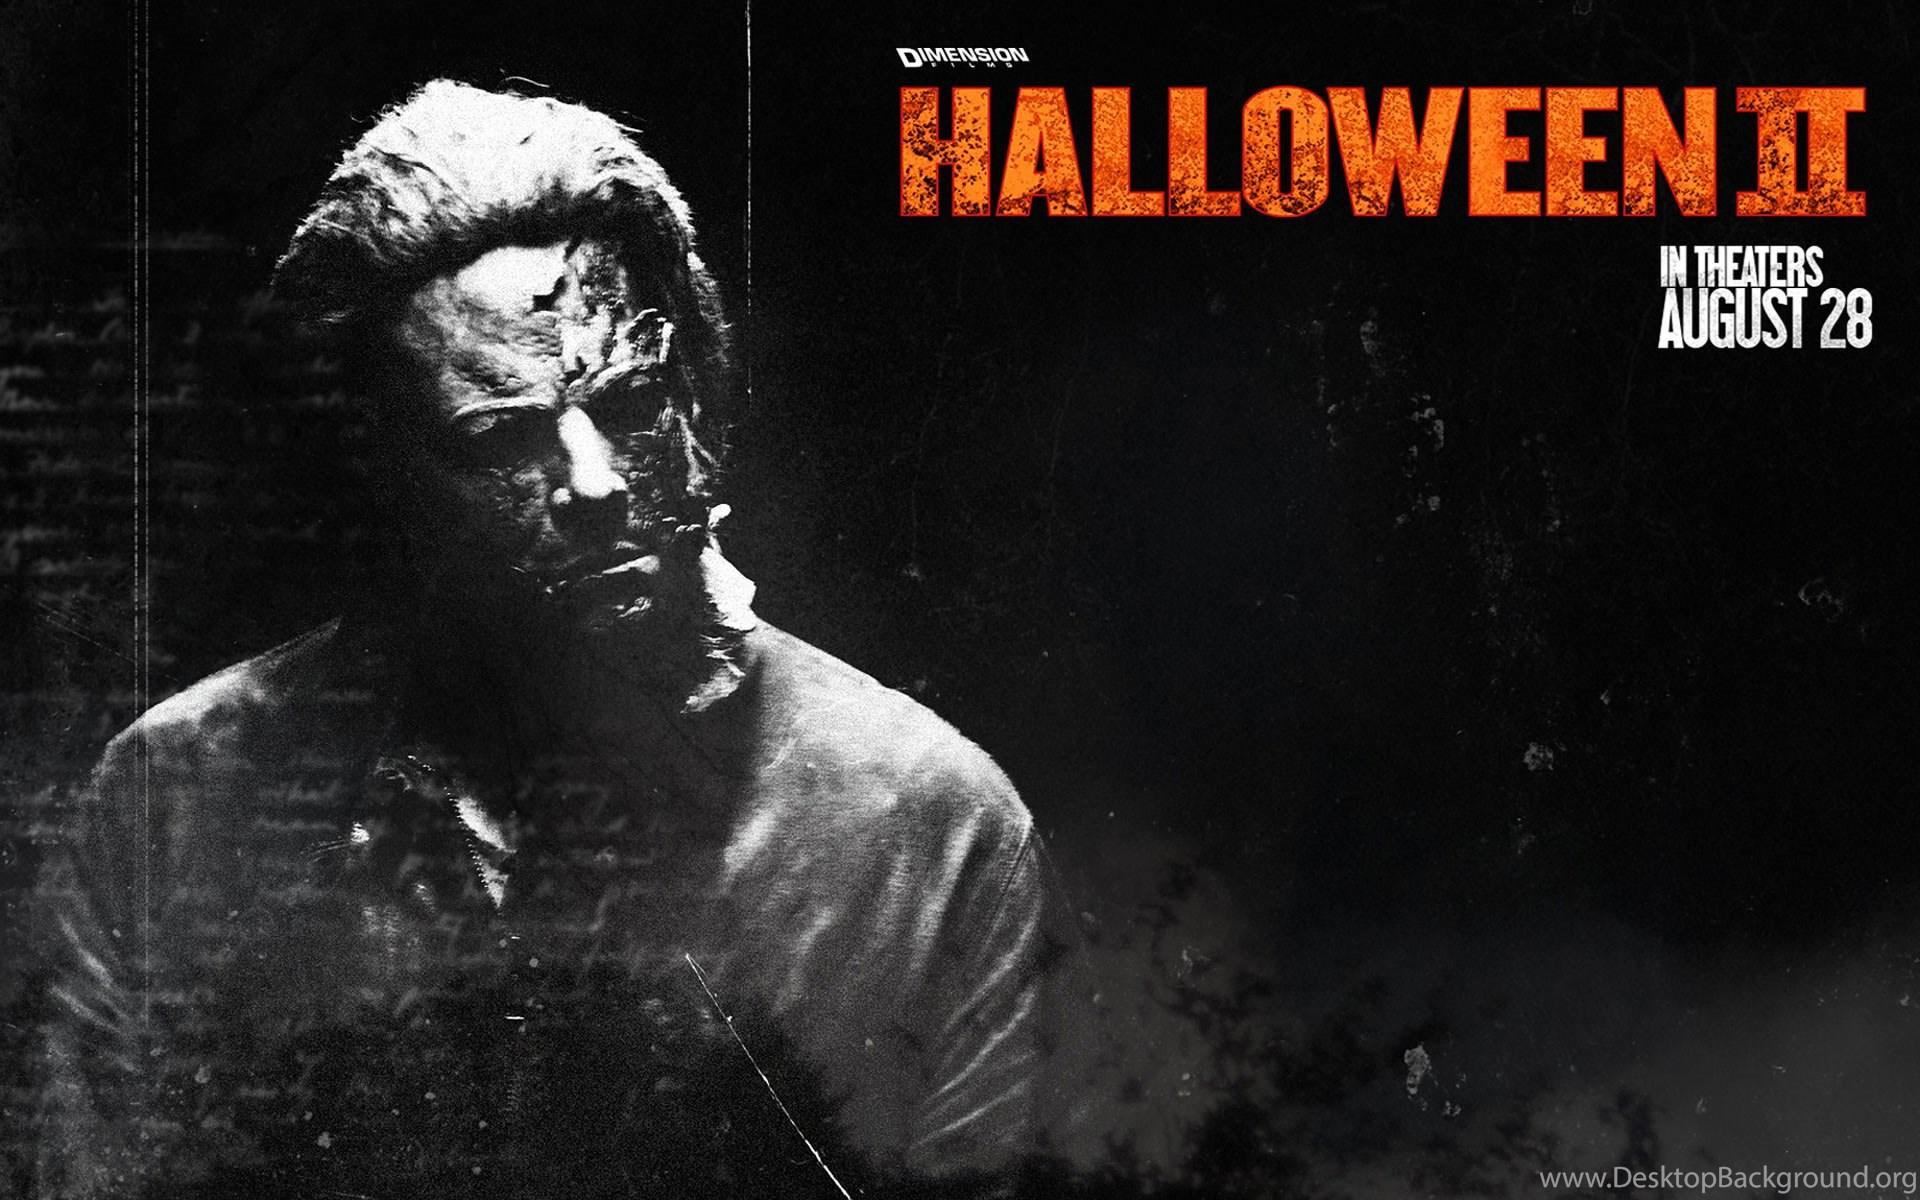 halloween iirob zombie, 2009, sheri moon zombie < movies